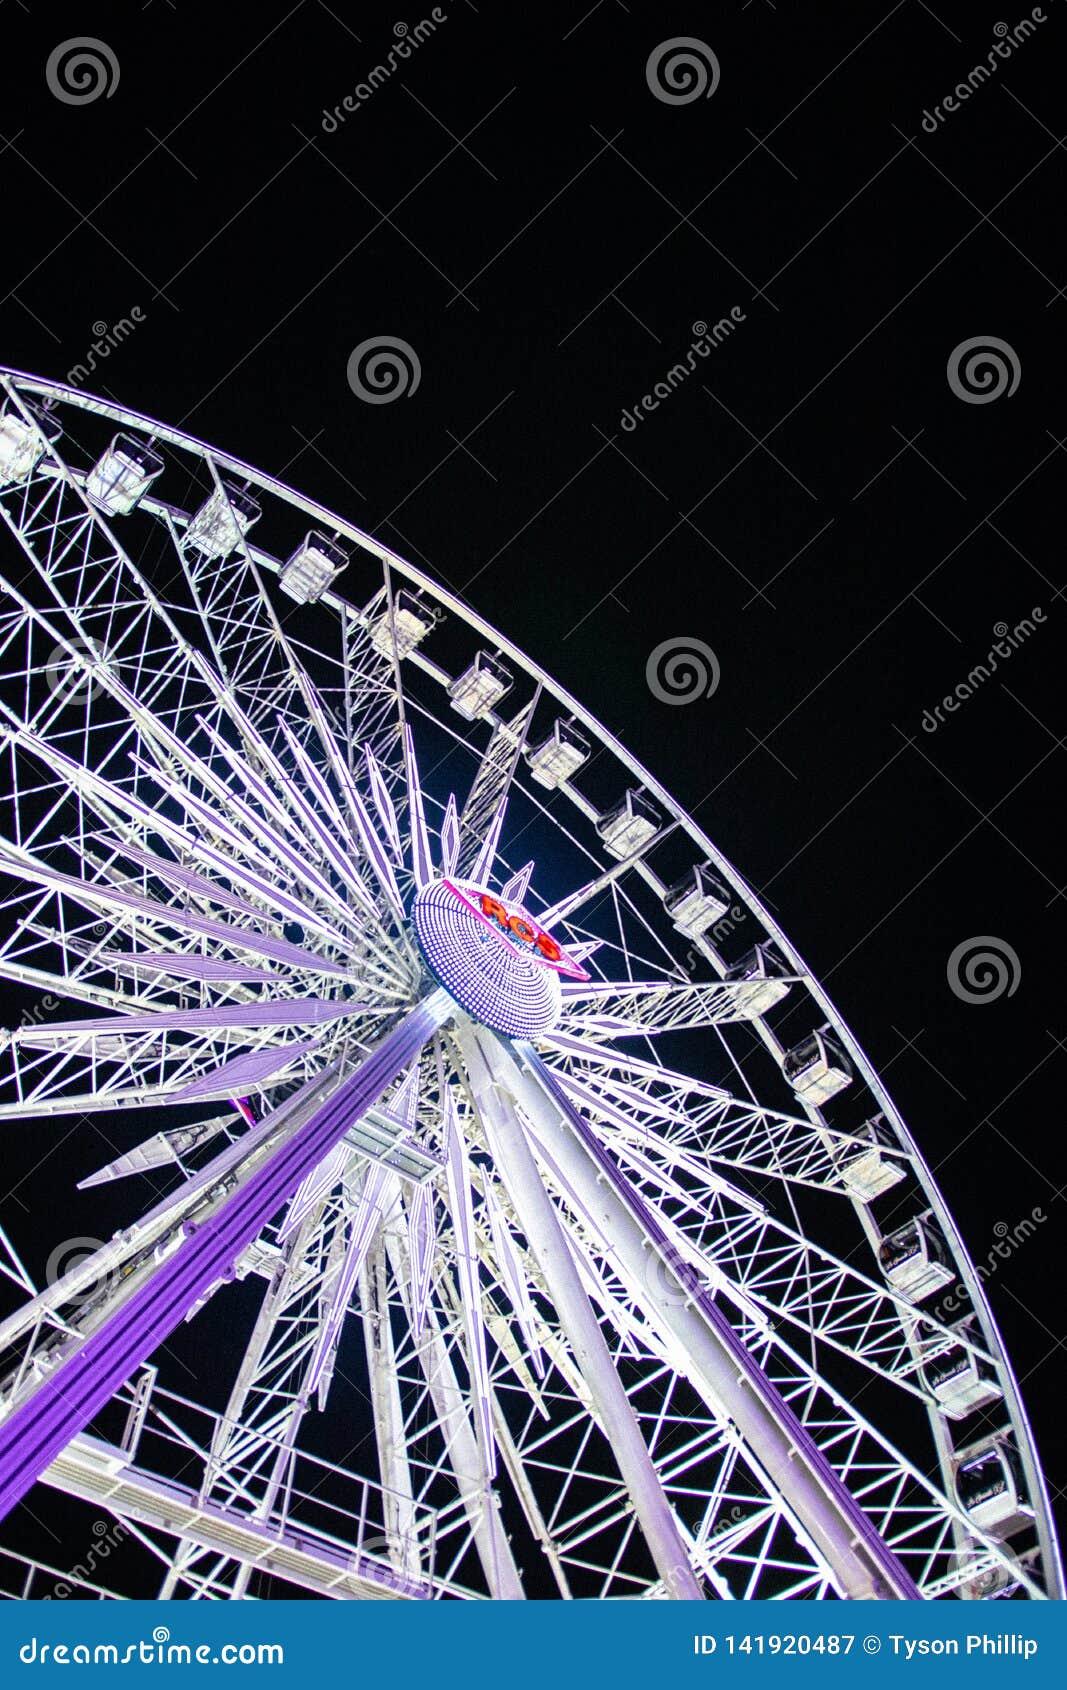 Late night carnival scene with ferris wheel